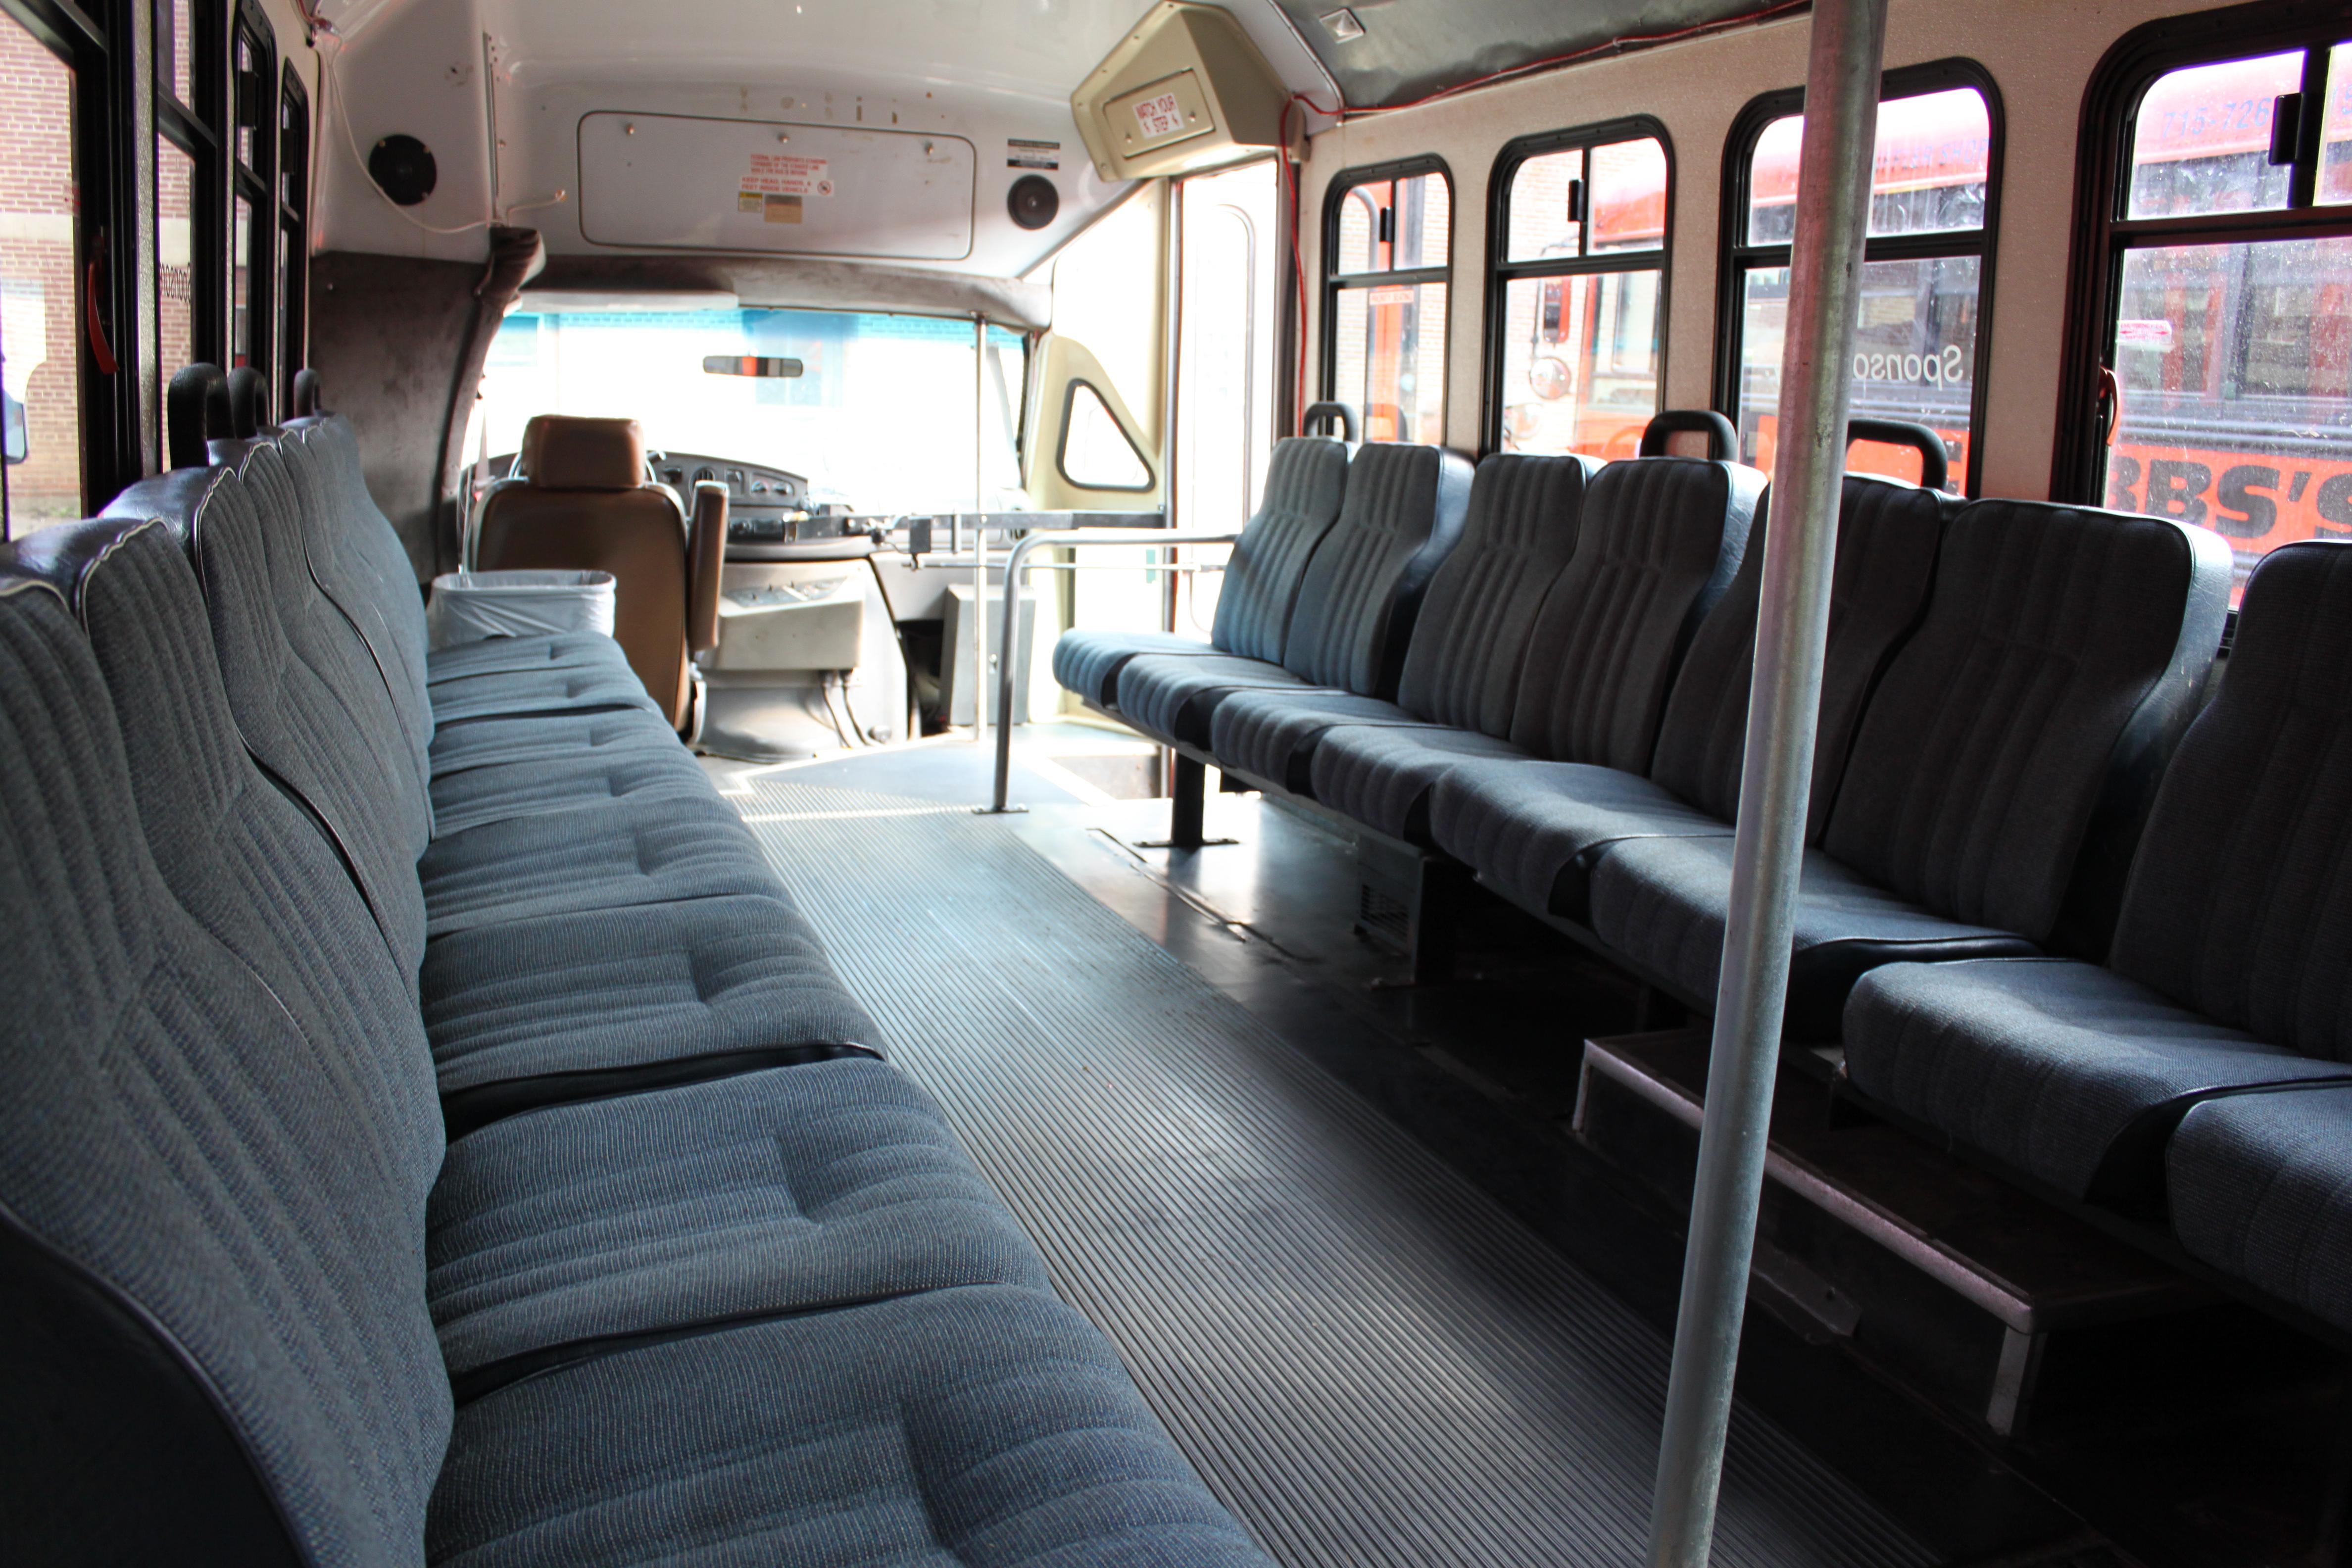 18-passenger bus